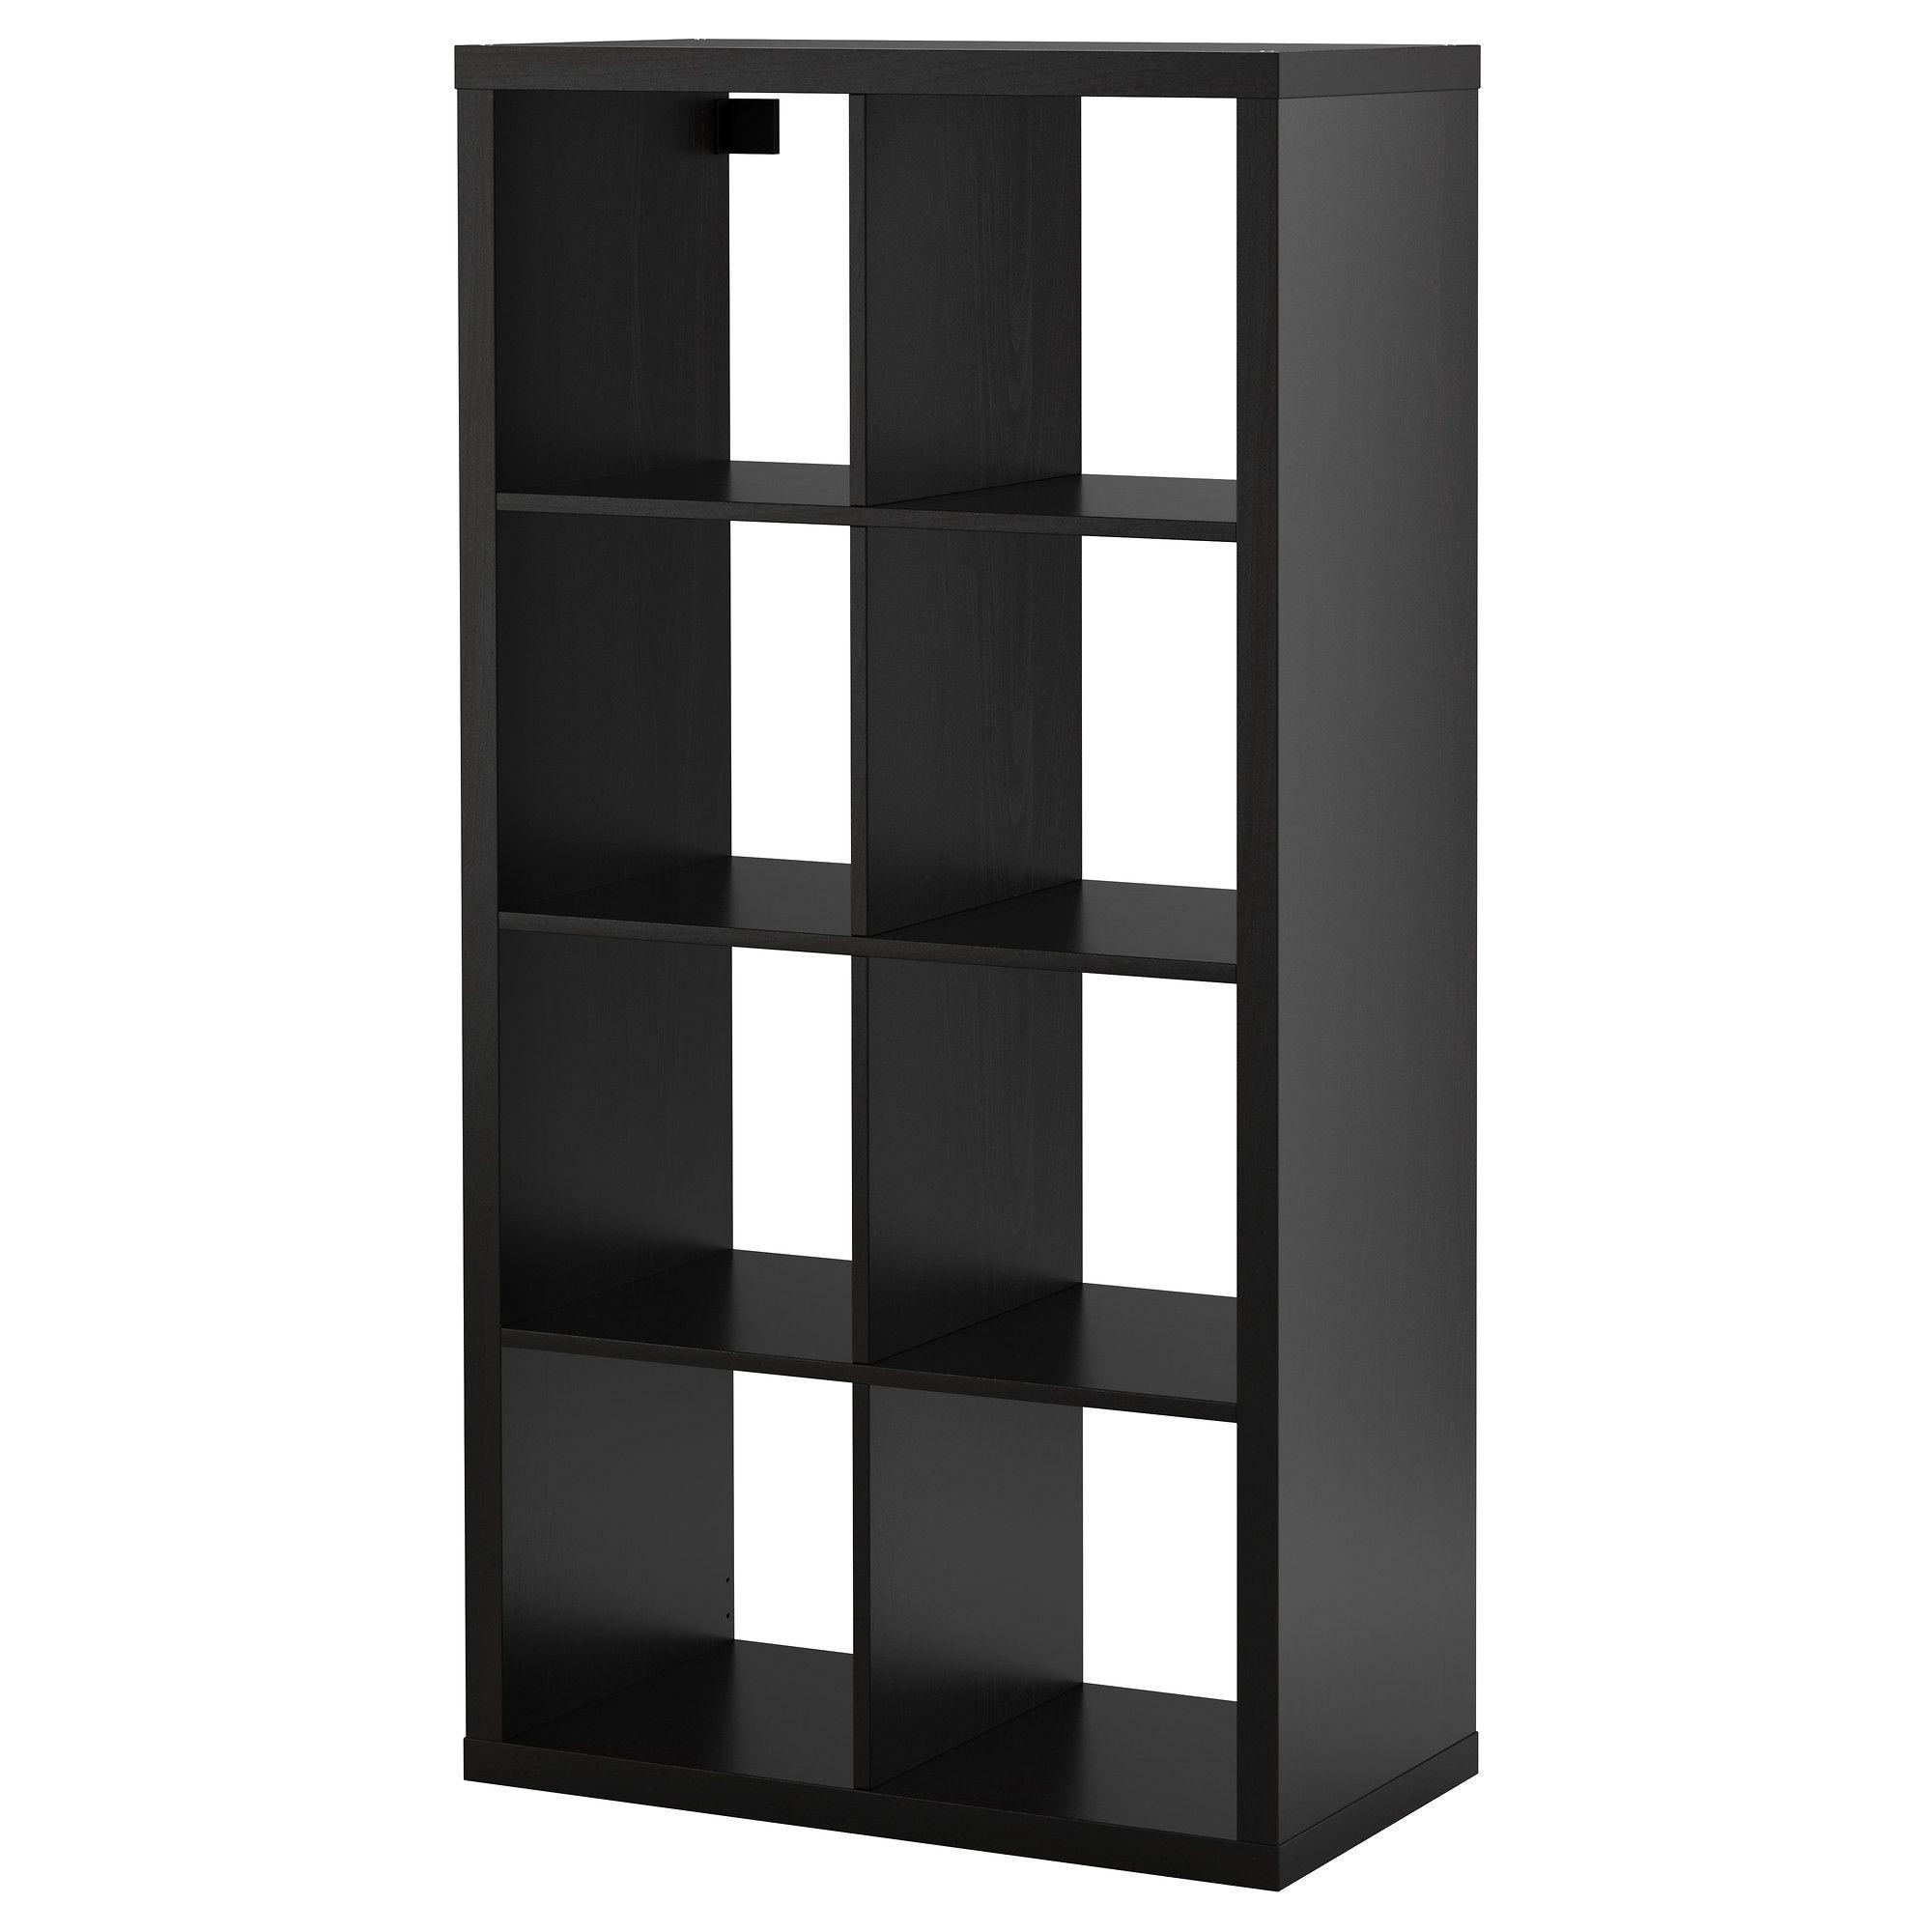 Kallax Shelf Unit Black Brown 30 3 8x57 7 8 Ikea Shelving